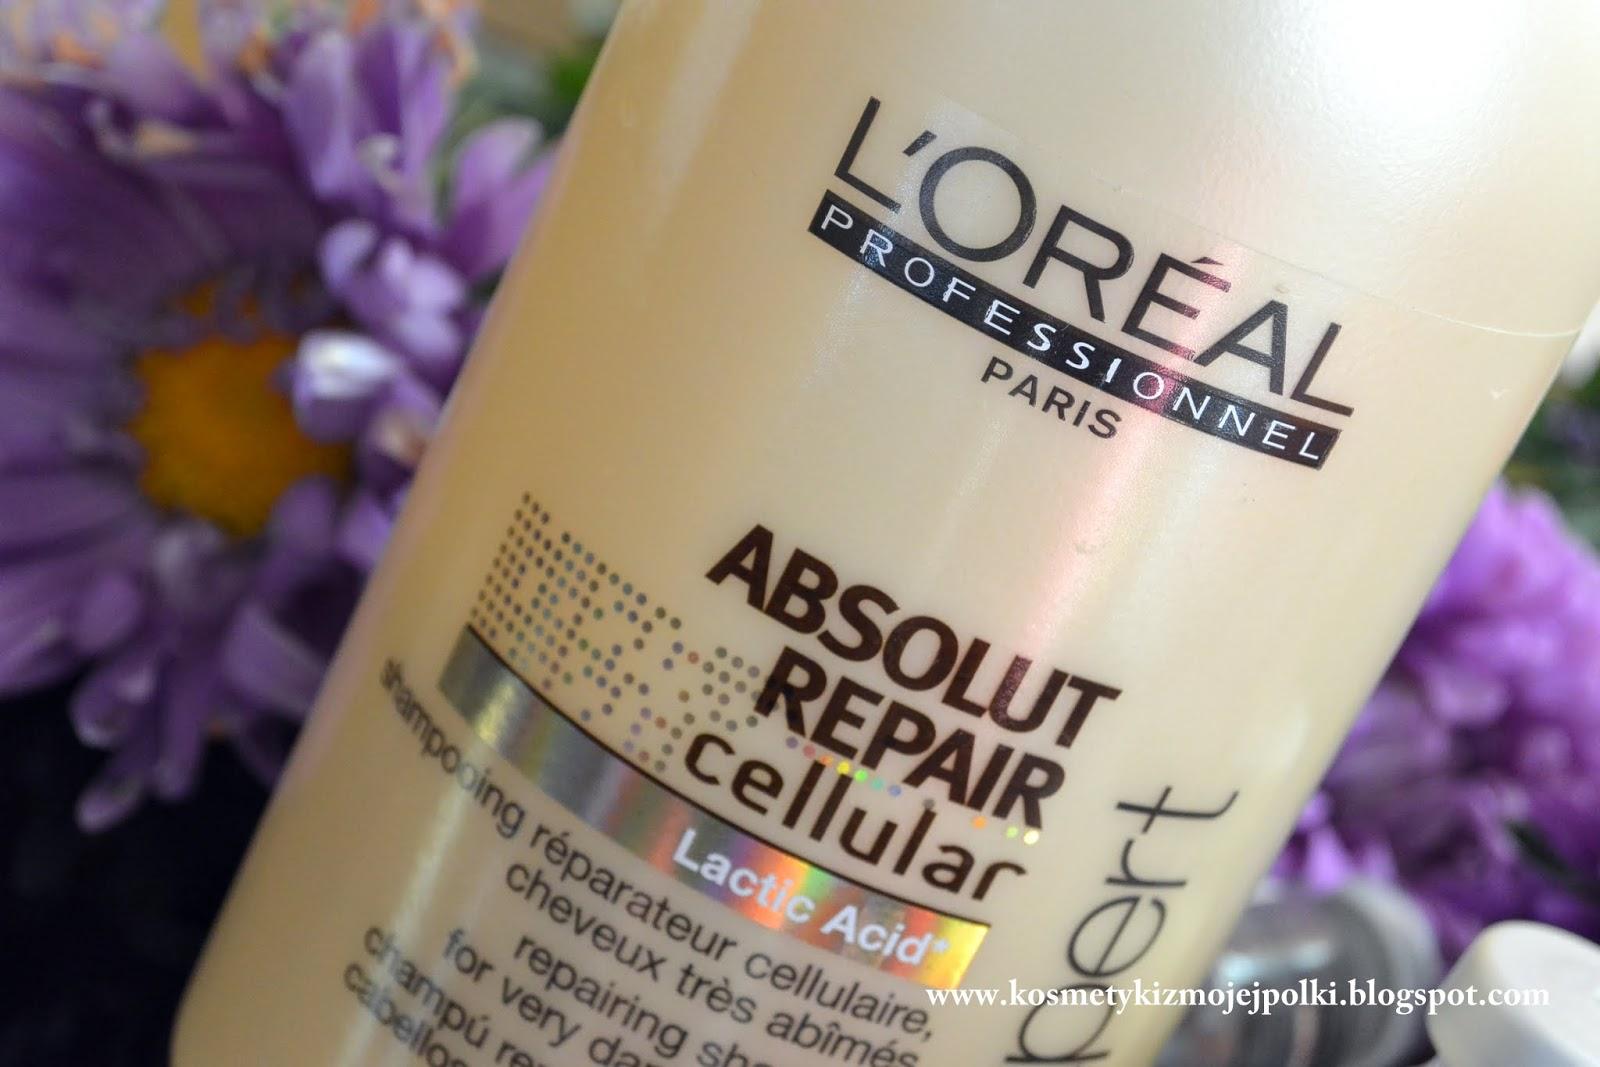 Na ratunek zniszczonym włosom - L'Oreal Professionnel Absolut Repair Cellular